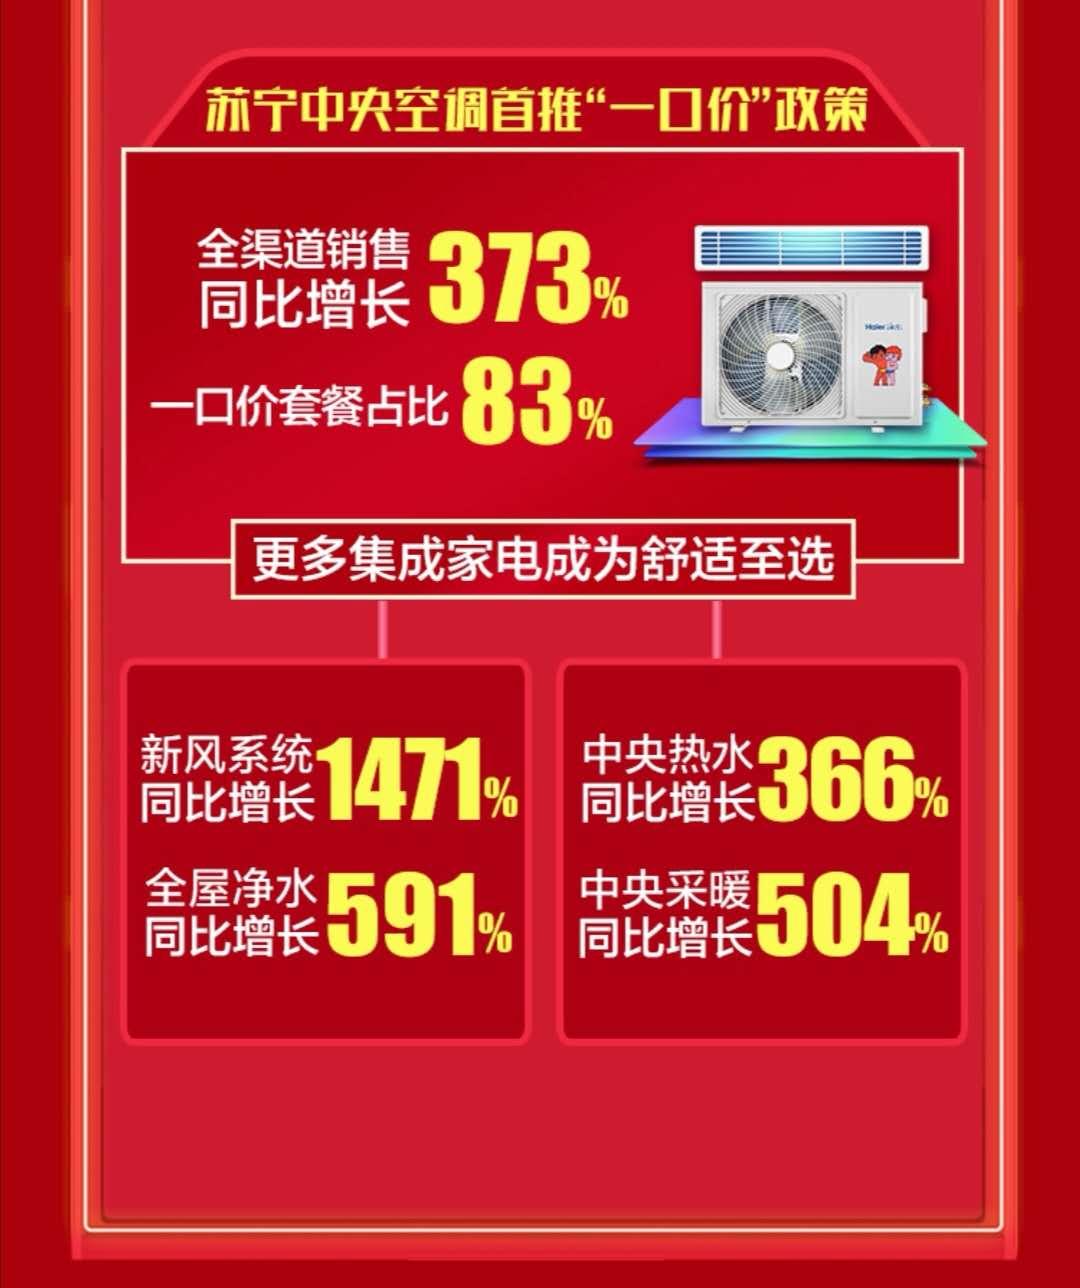 C:\Users\14051171\AppData\Local\Temp\WeChat Files\5446f014047429b04ac7c6c42f21605.jpg